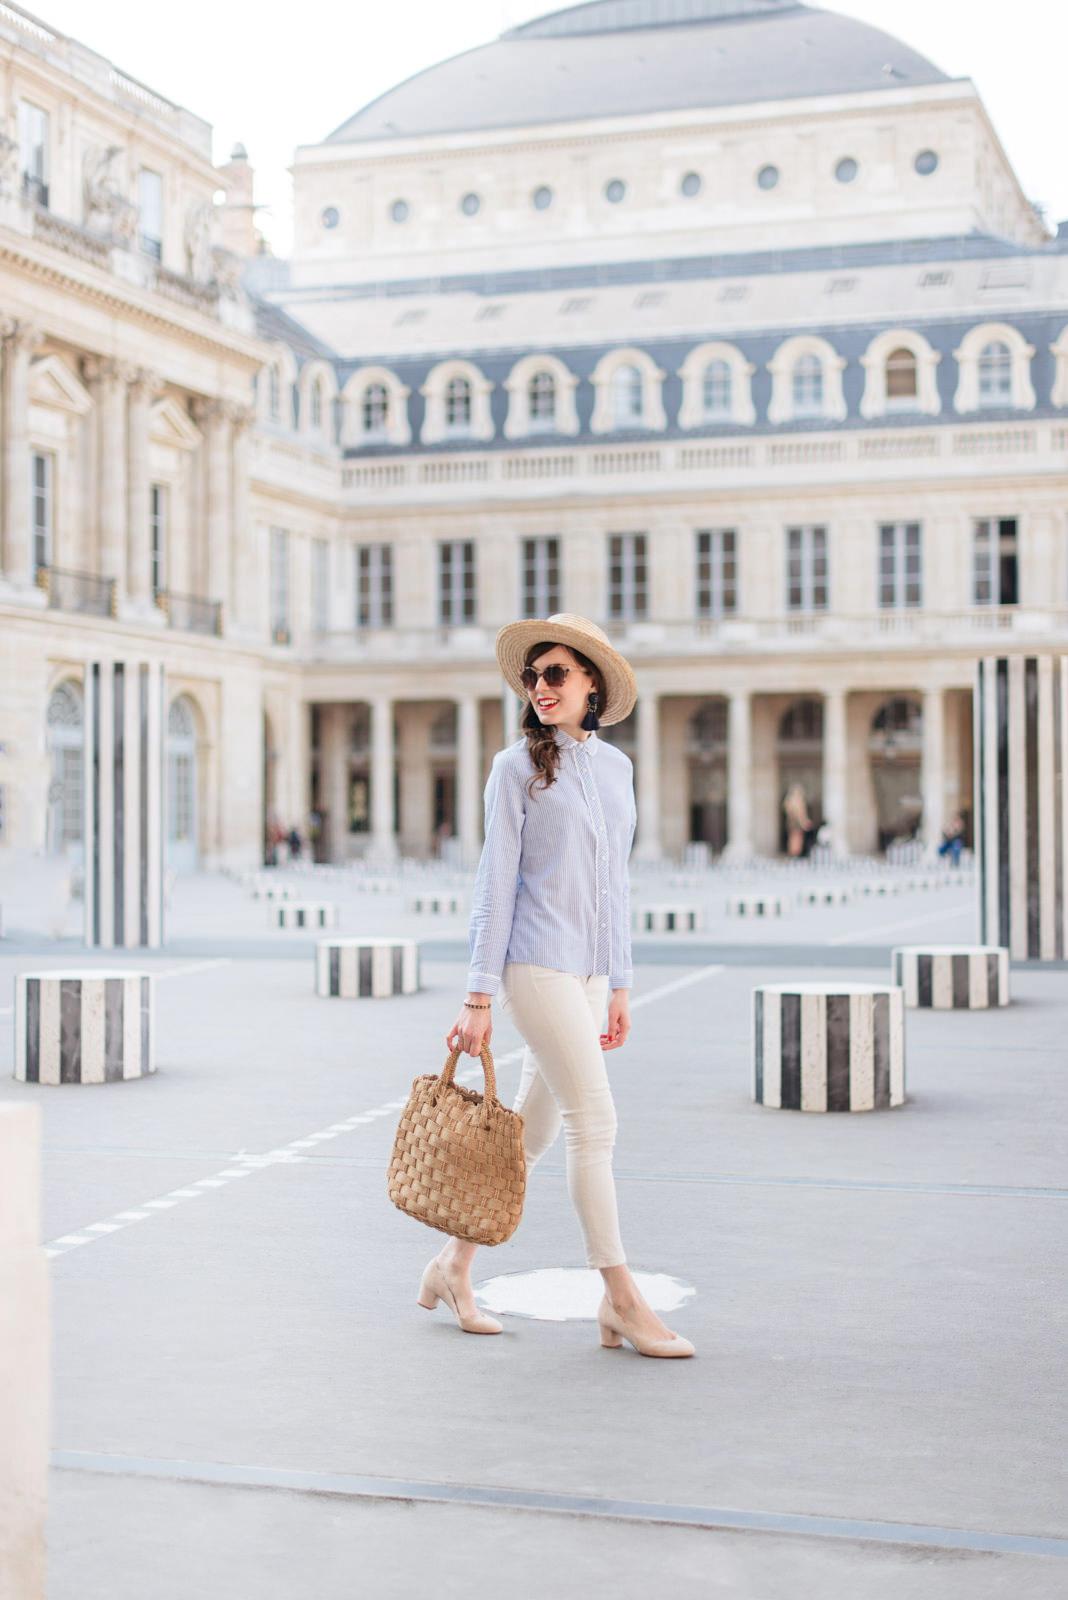 Blog-Mode-And-The-City-Looks-Printemps-Palais-Royal-3 copie